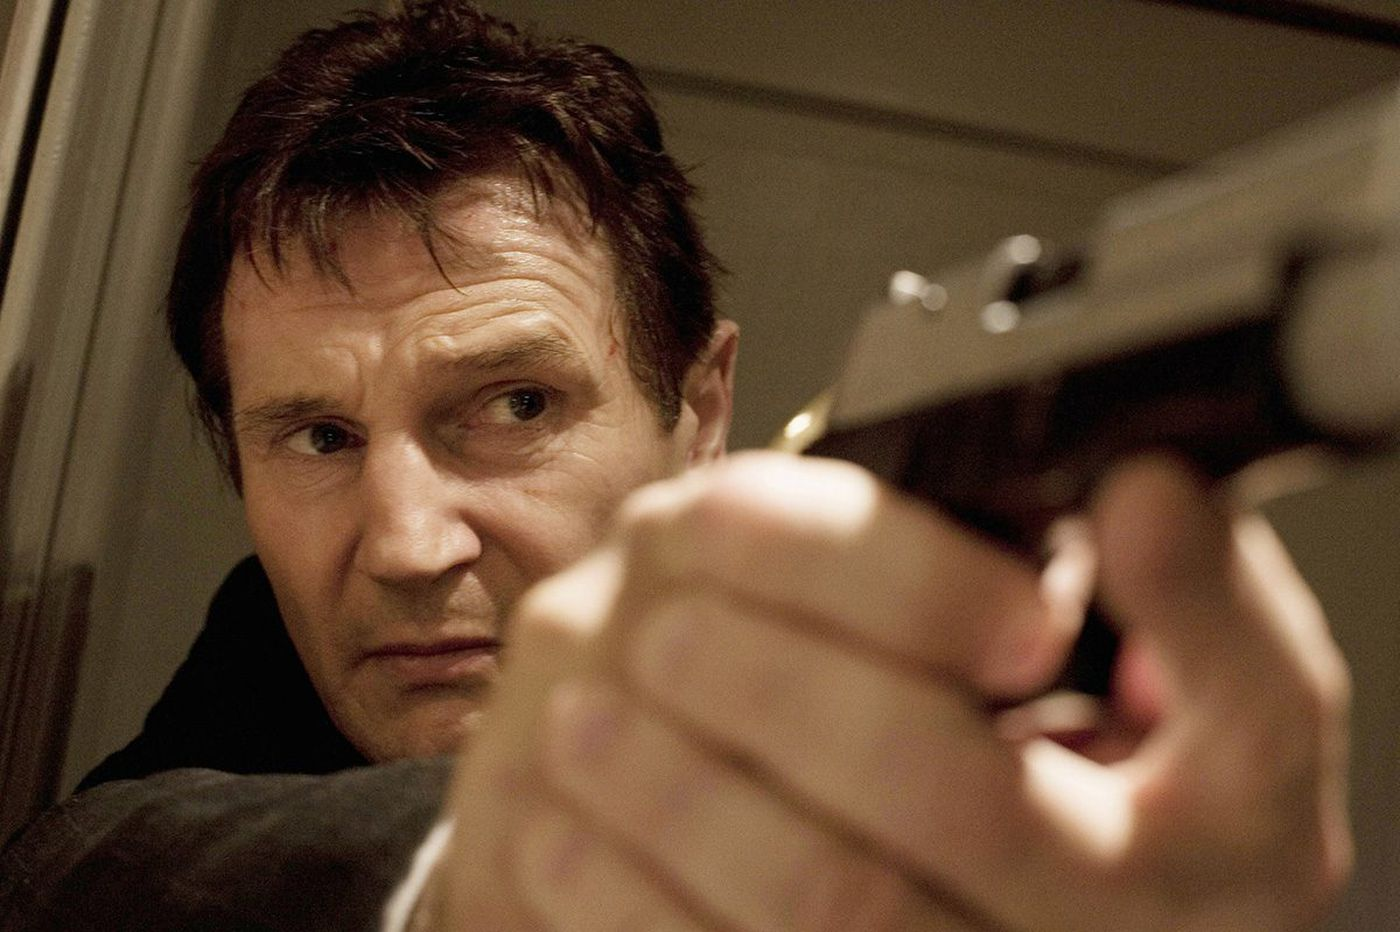 Gun violence at the movies is so bad, parents think the PG-13 rating isn't tough enough